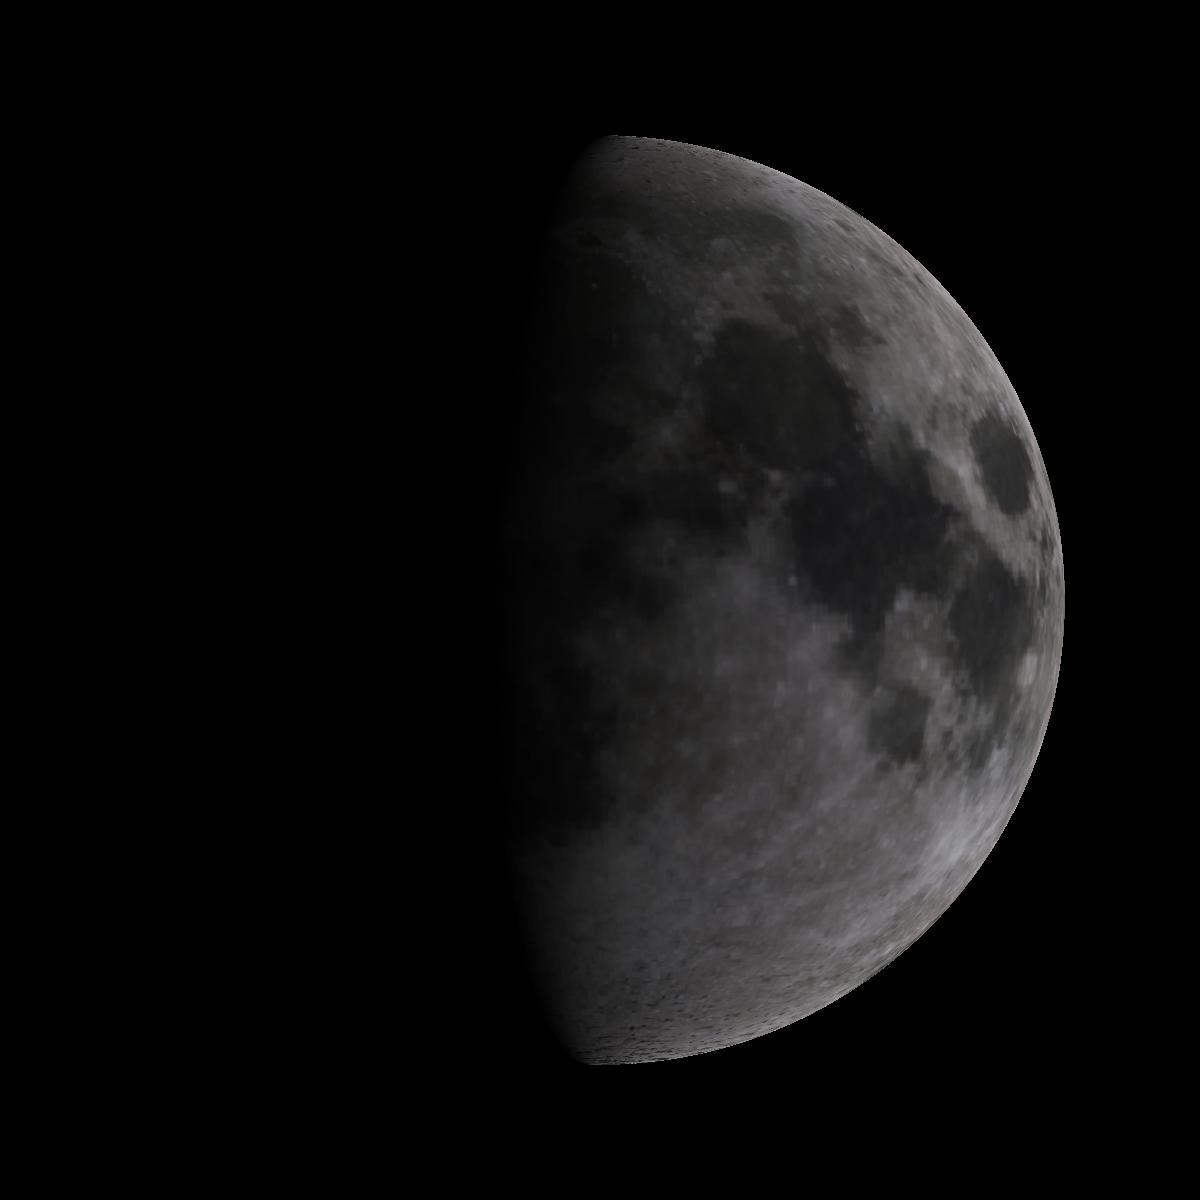 Lune du 4 mars 2020